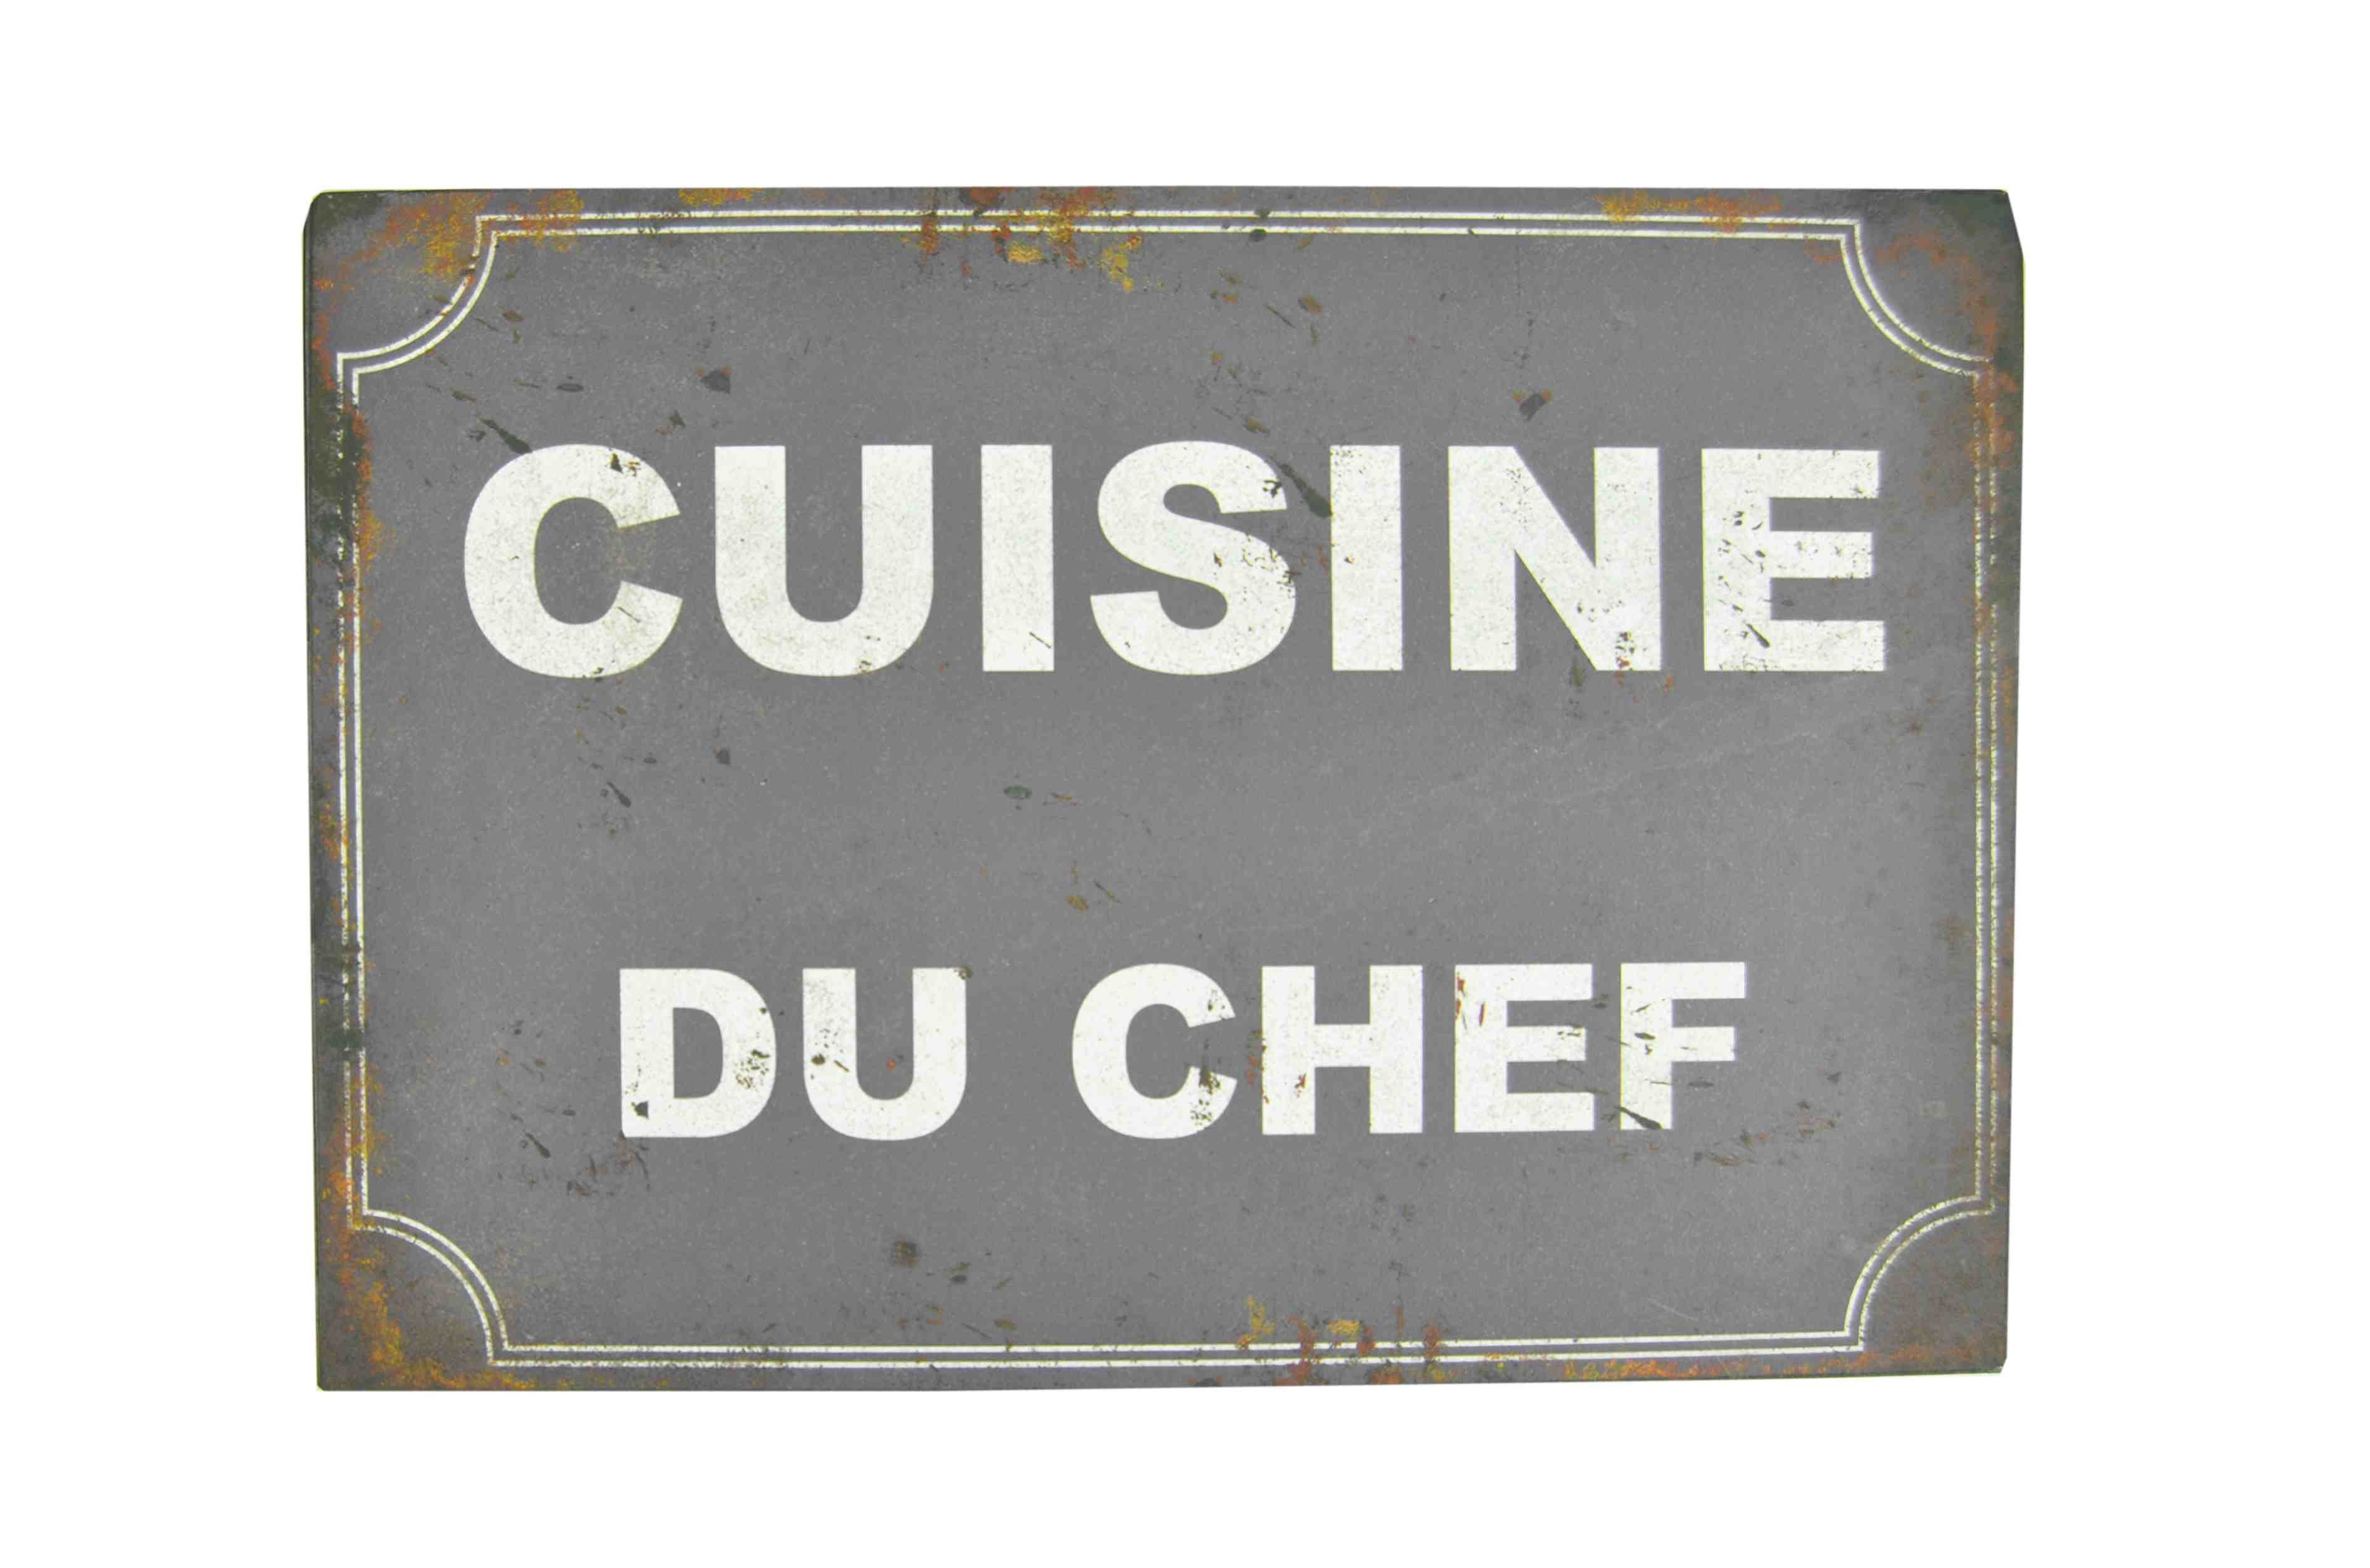 Табличка Сuisine du chefДругое<br>Материал: Железо, Бумага<br><br>Material: Железо<br>Length см: None<br>Width см: 33<br>Depth см: 2<br>Height см: 23.1